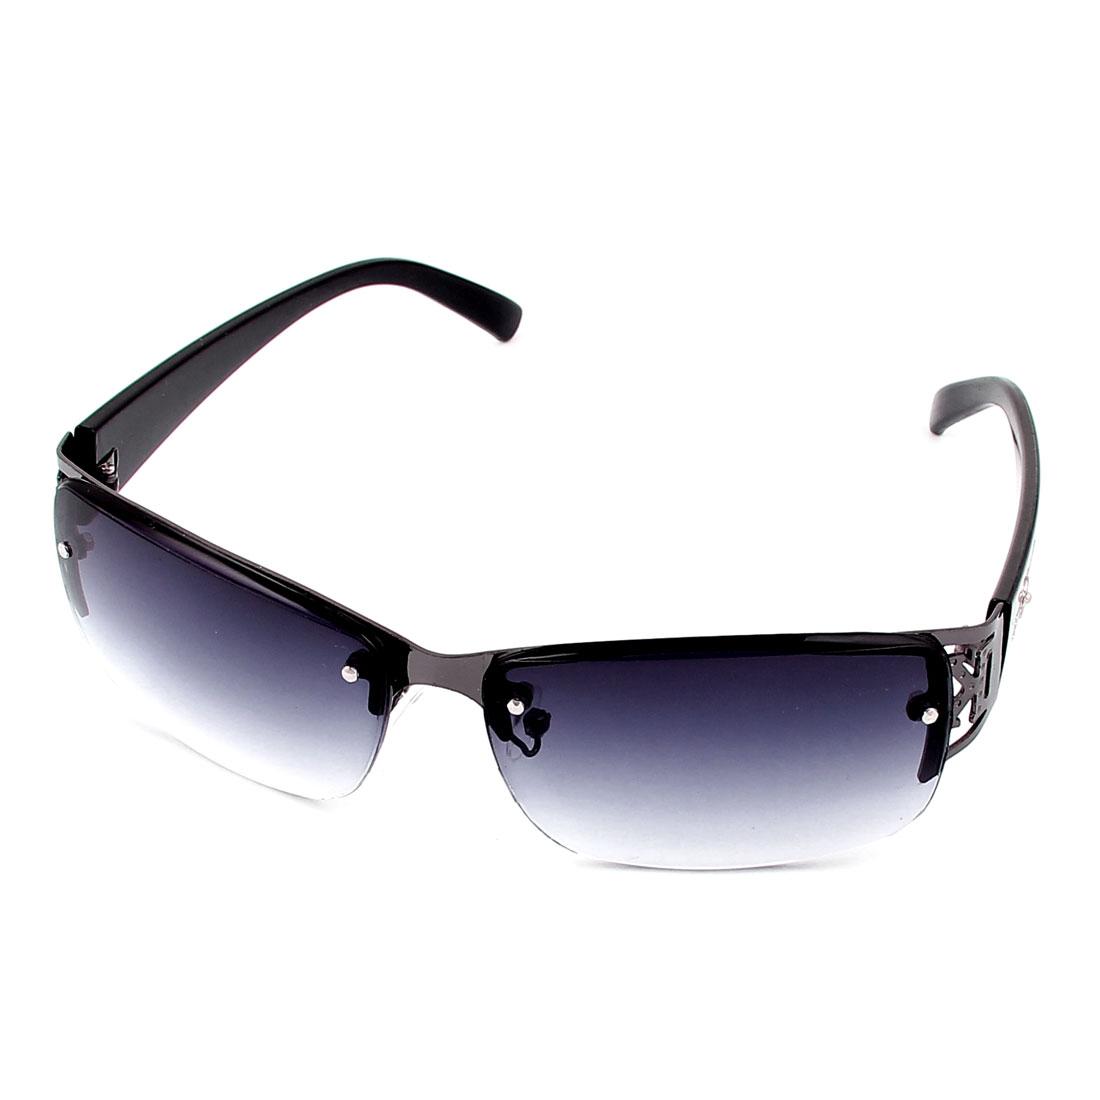 Unisex Half Rimless Sunglasses Glasses Eyewear Eyes Protecter Gray